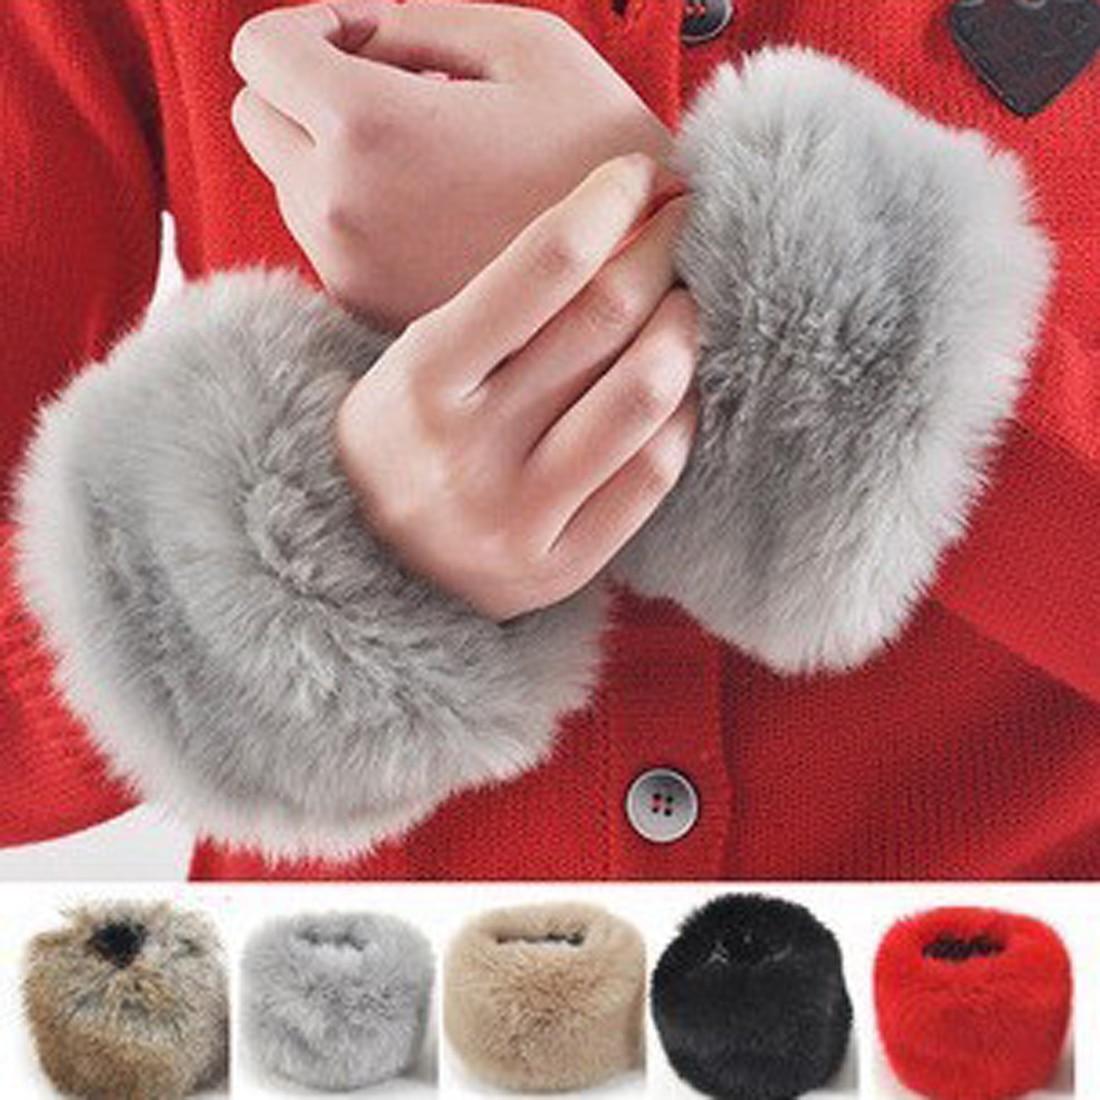 Hot Warm Faux Fur Wrist Slap On Cuffs Winter Ladies Solid Color Plush Wrist Protector Women's Warmer Cuffs Arm Warmers Wraps New